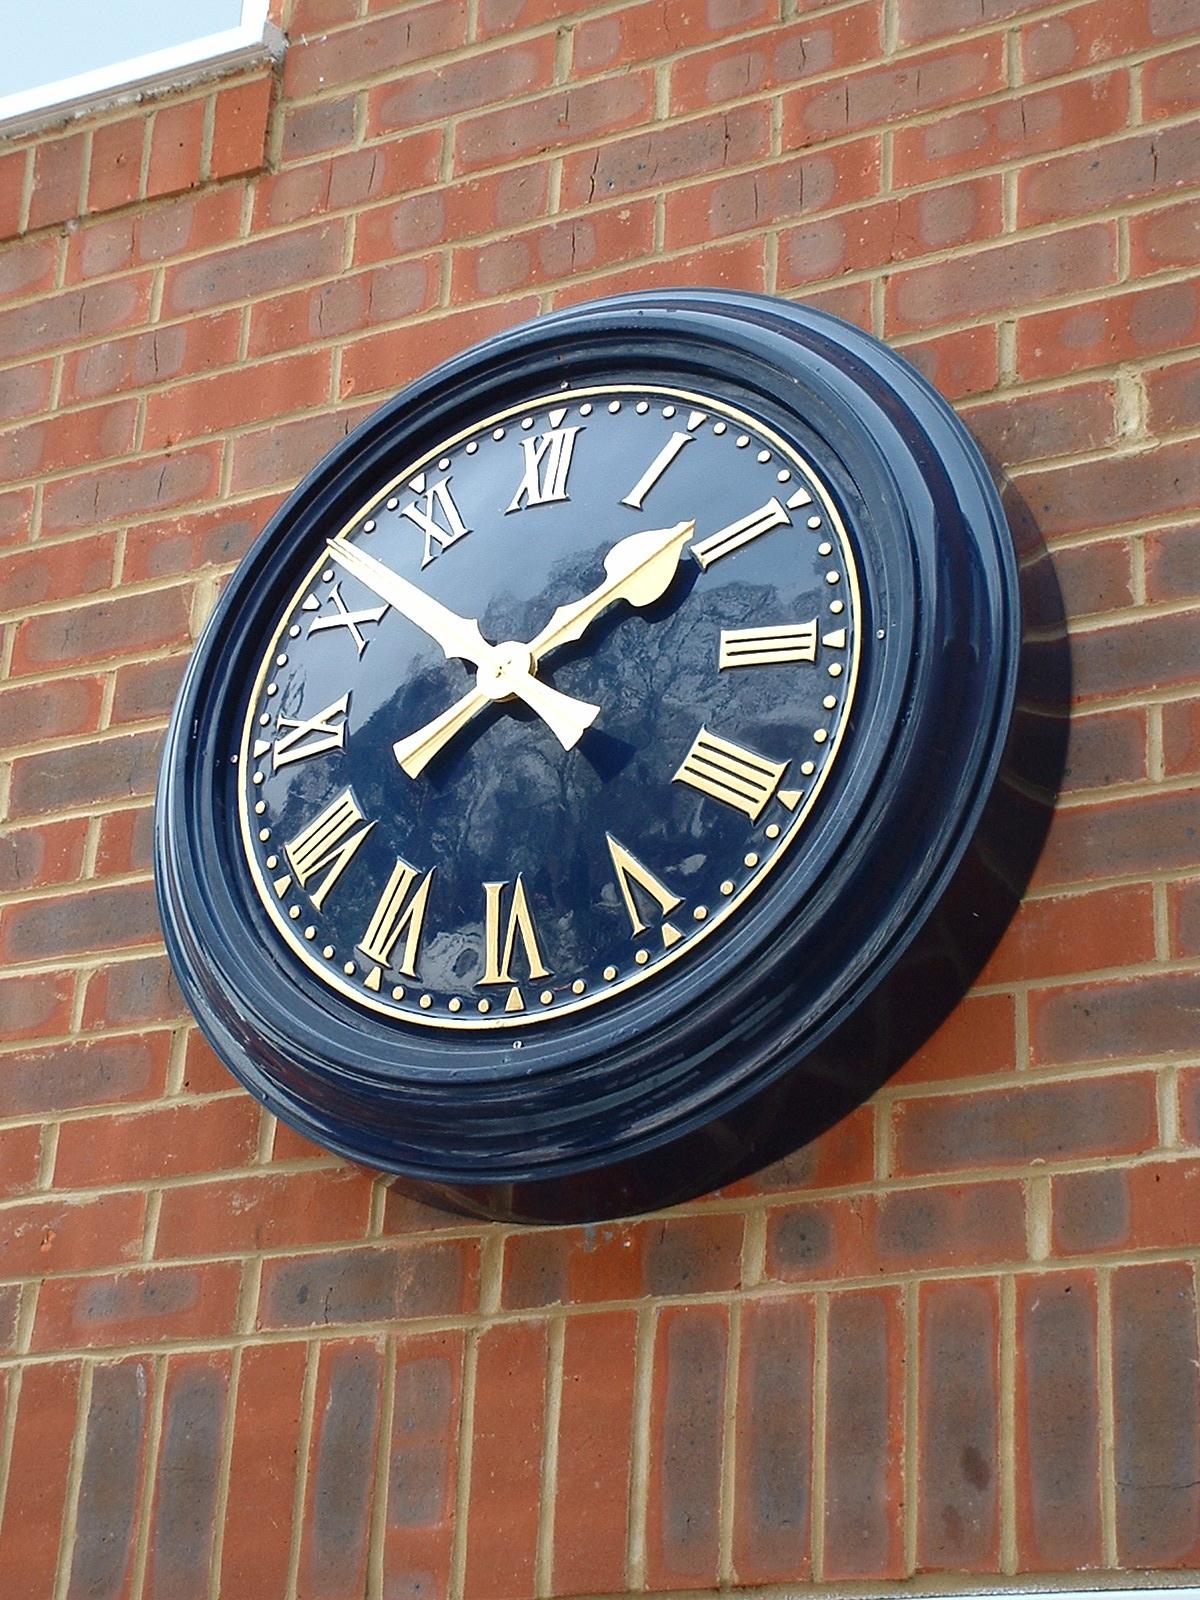 Blue clock with matching bezel